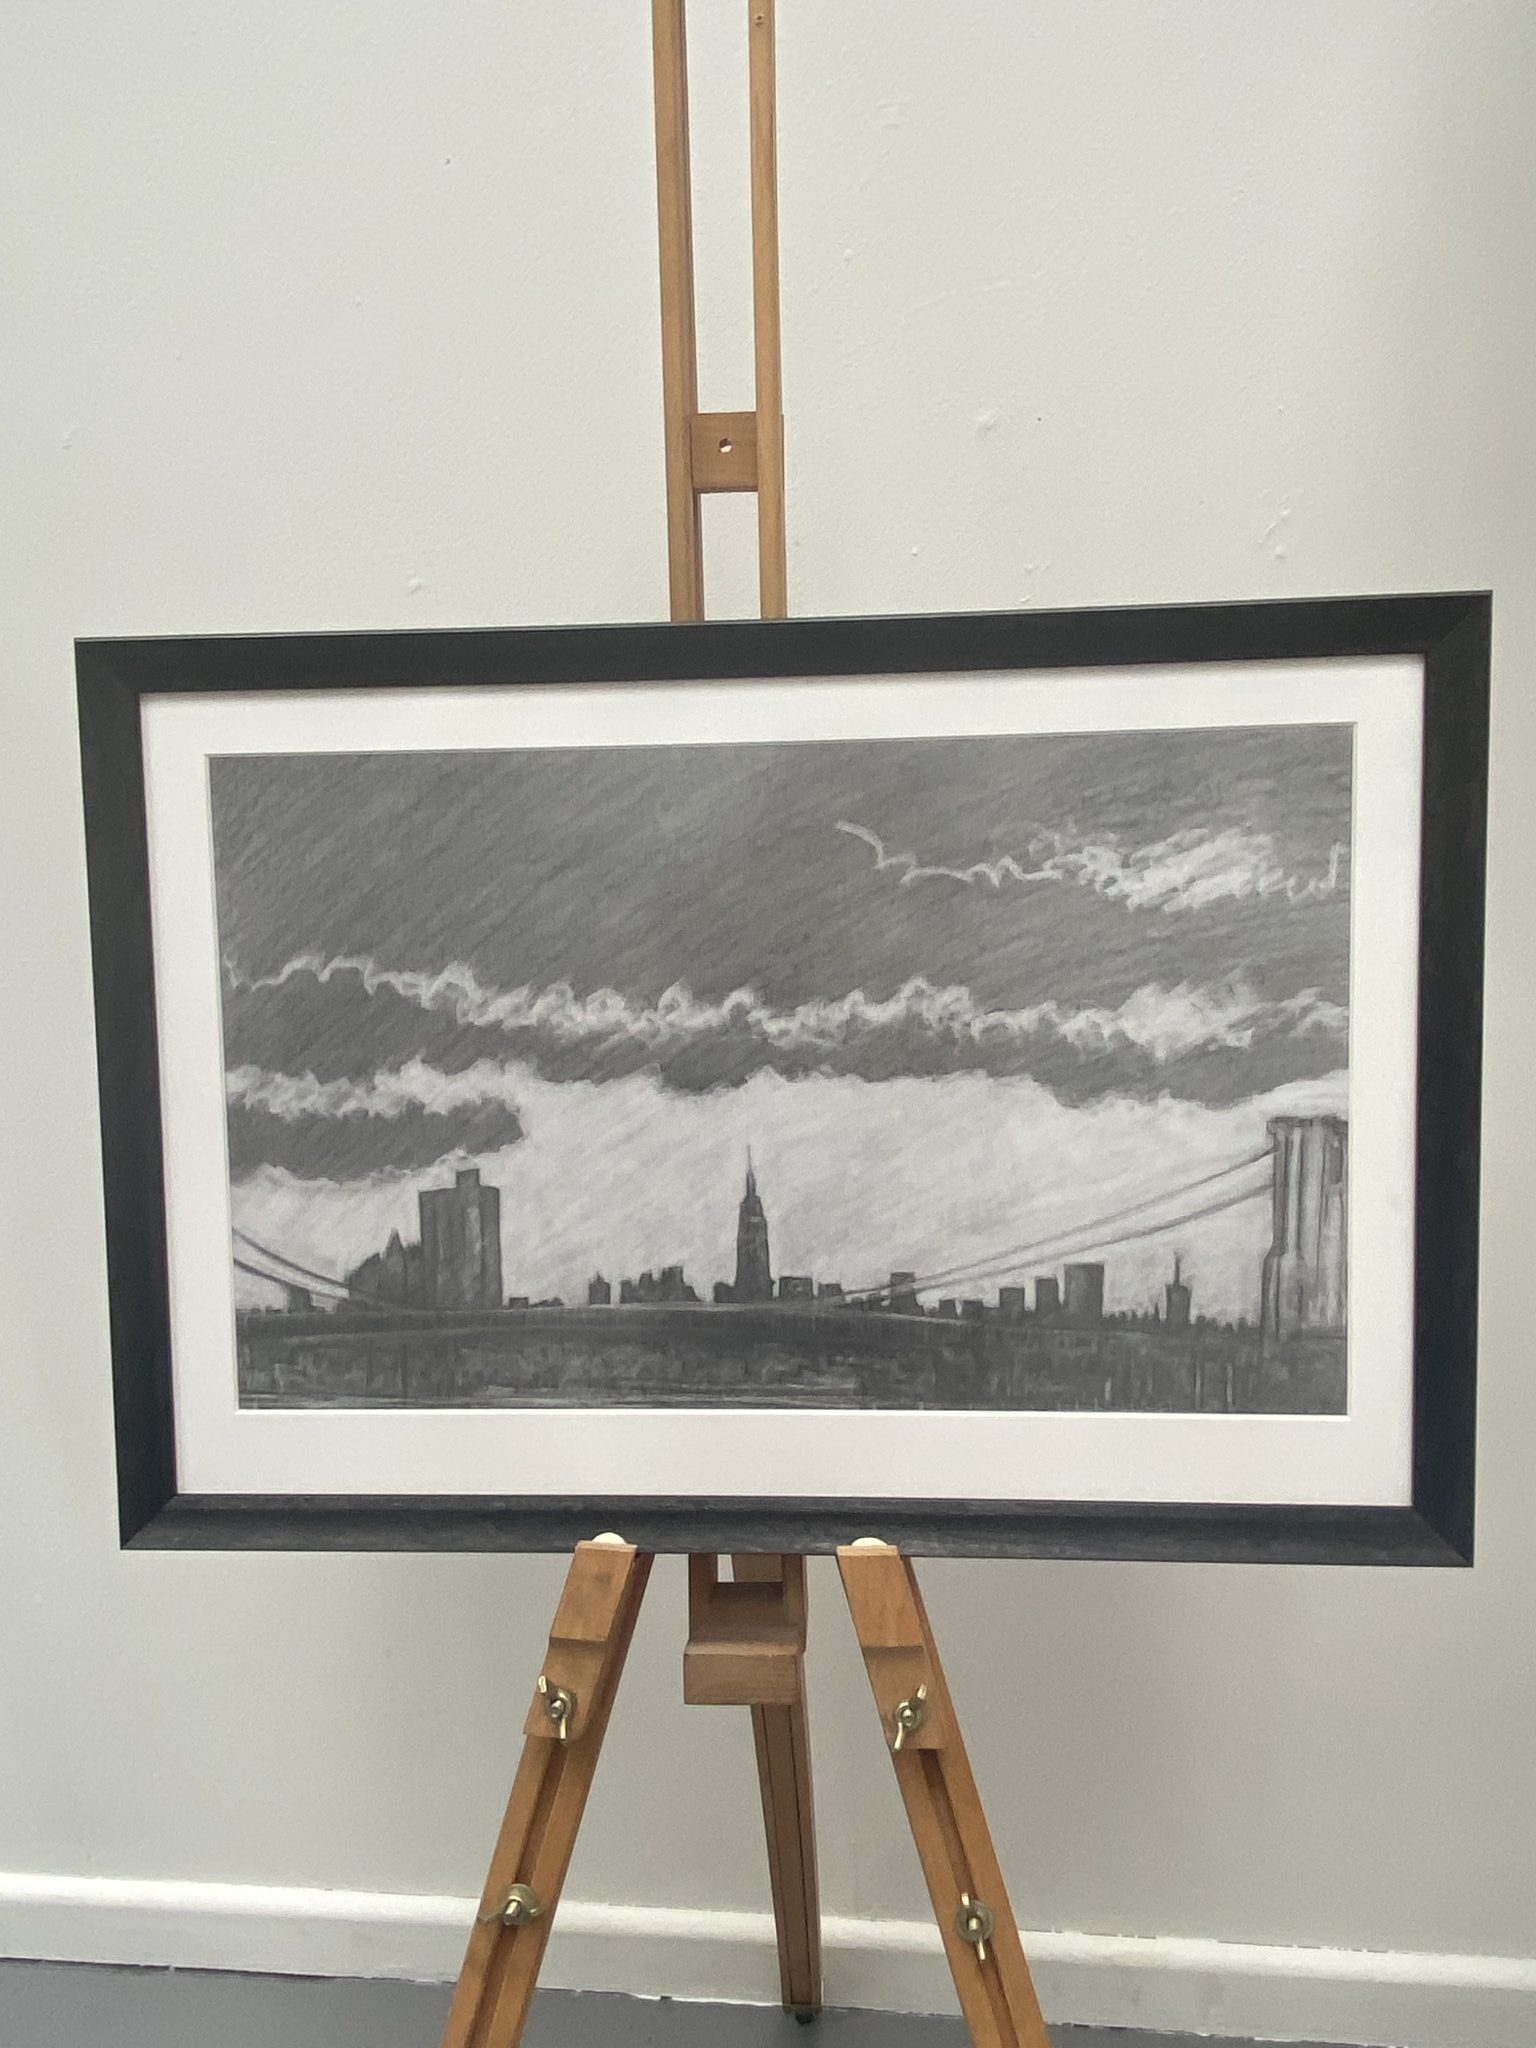 Empire State and Brooklyn Bridge, New York by Dave Gunning BA (Hons)